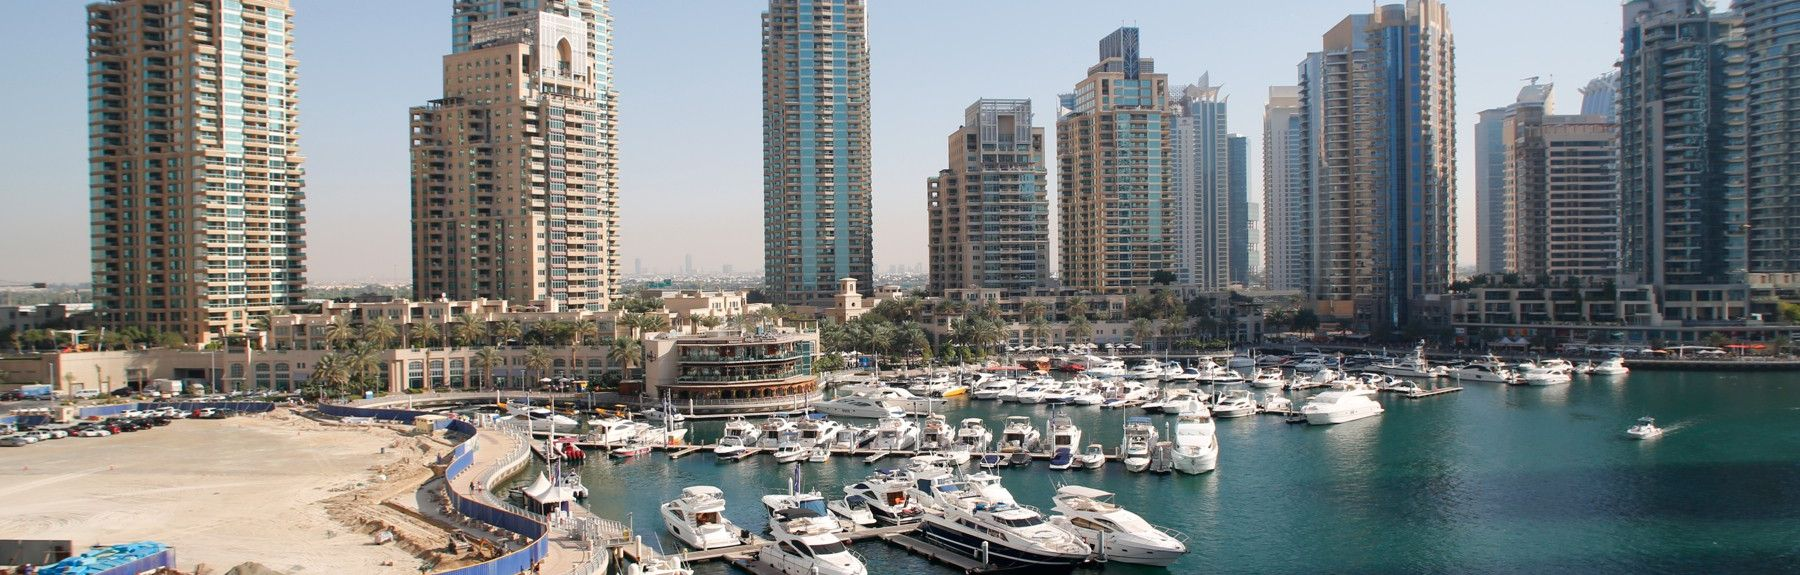 Al Sufouh 2, Dubai, Dubai, United Arab Emirates